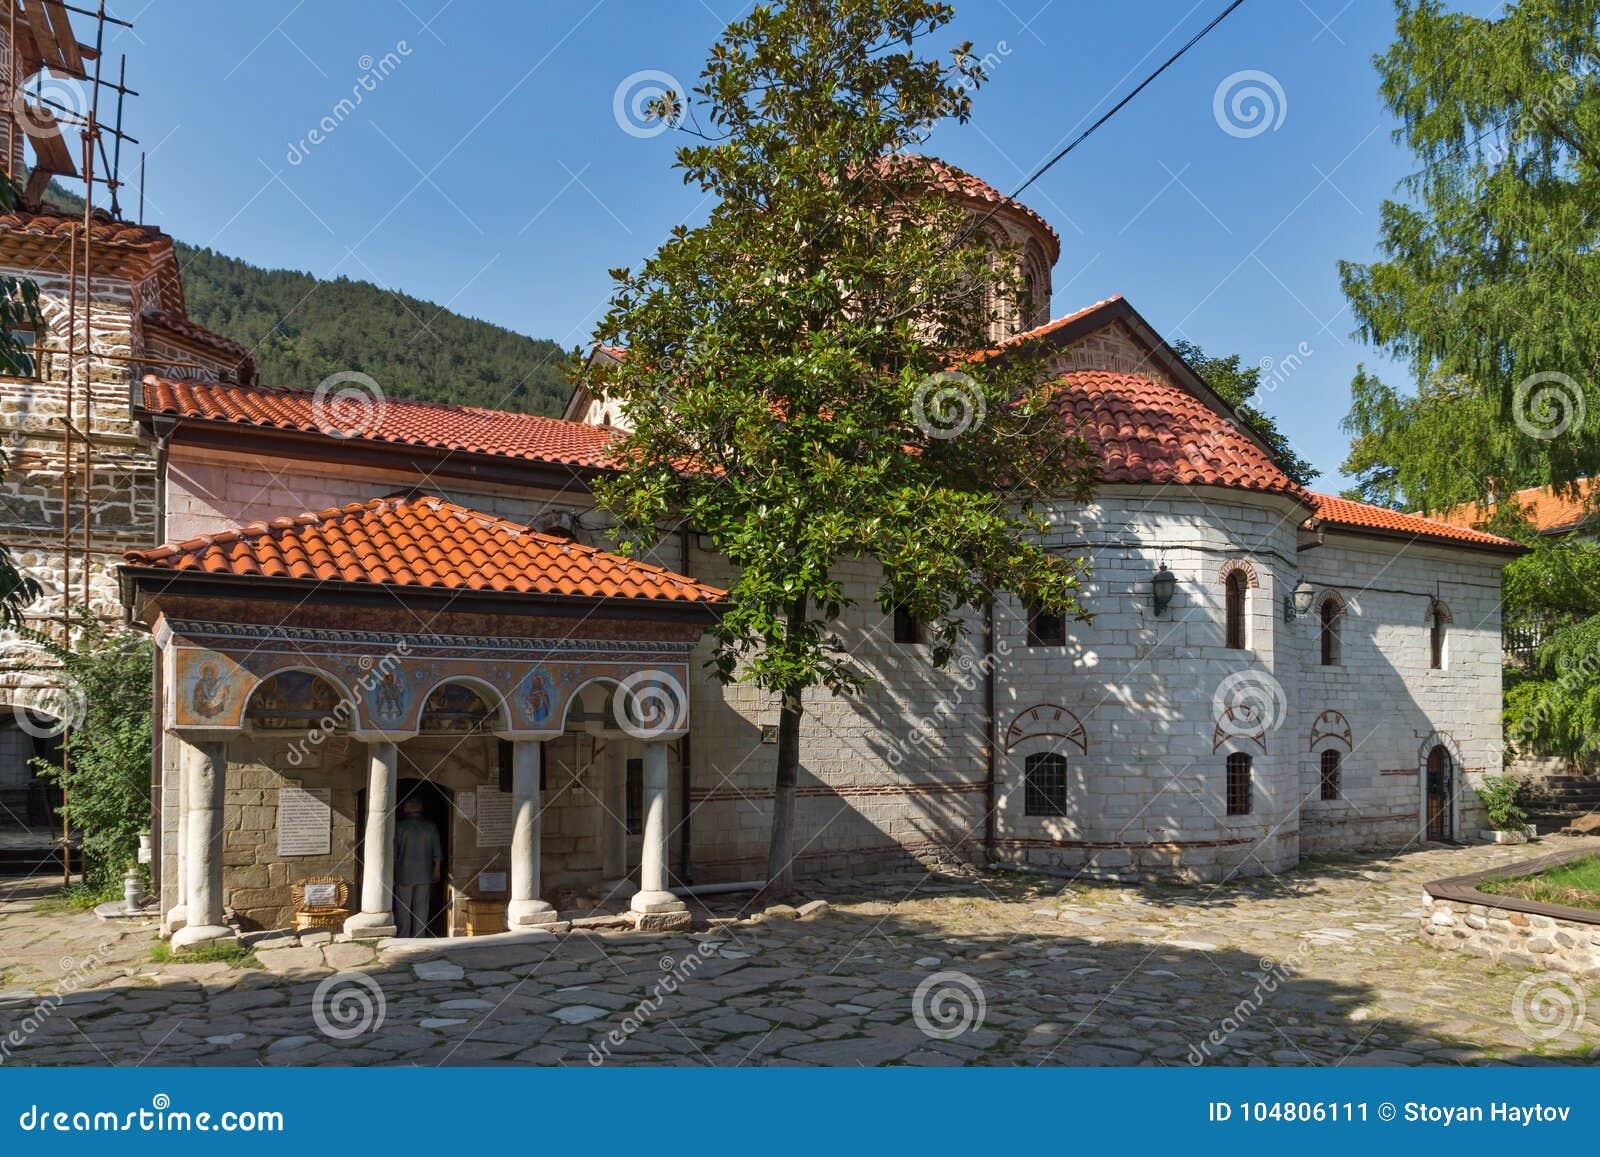 Old churches in Medieval Bachkovo Monastery, Bulgaria